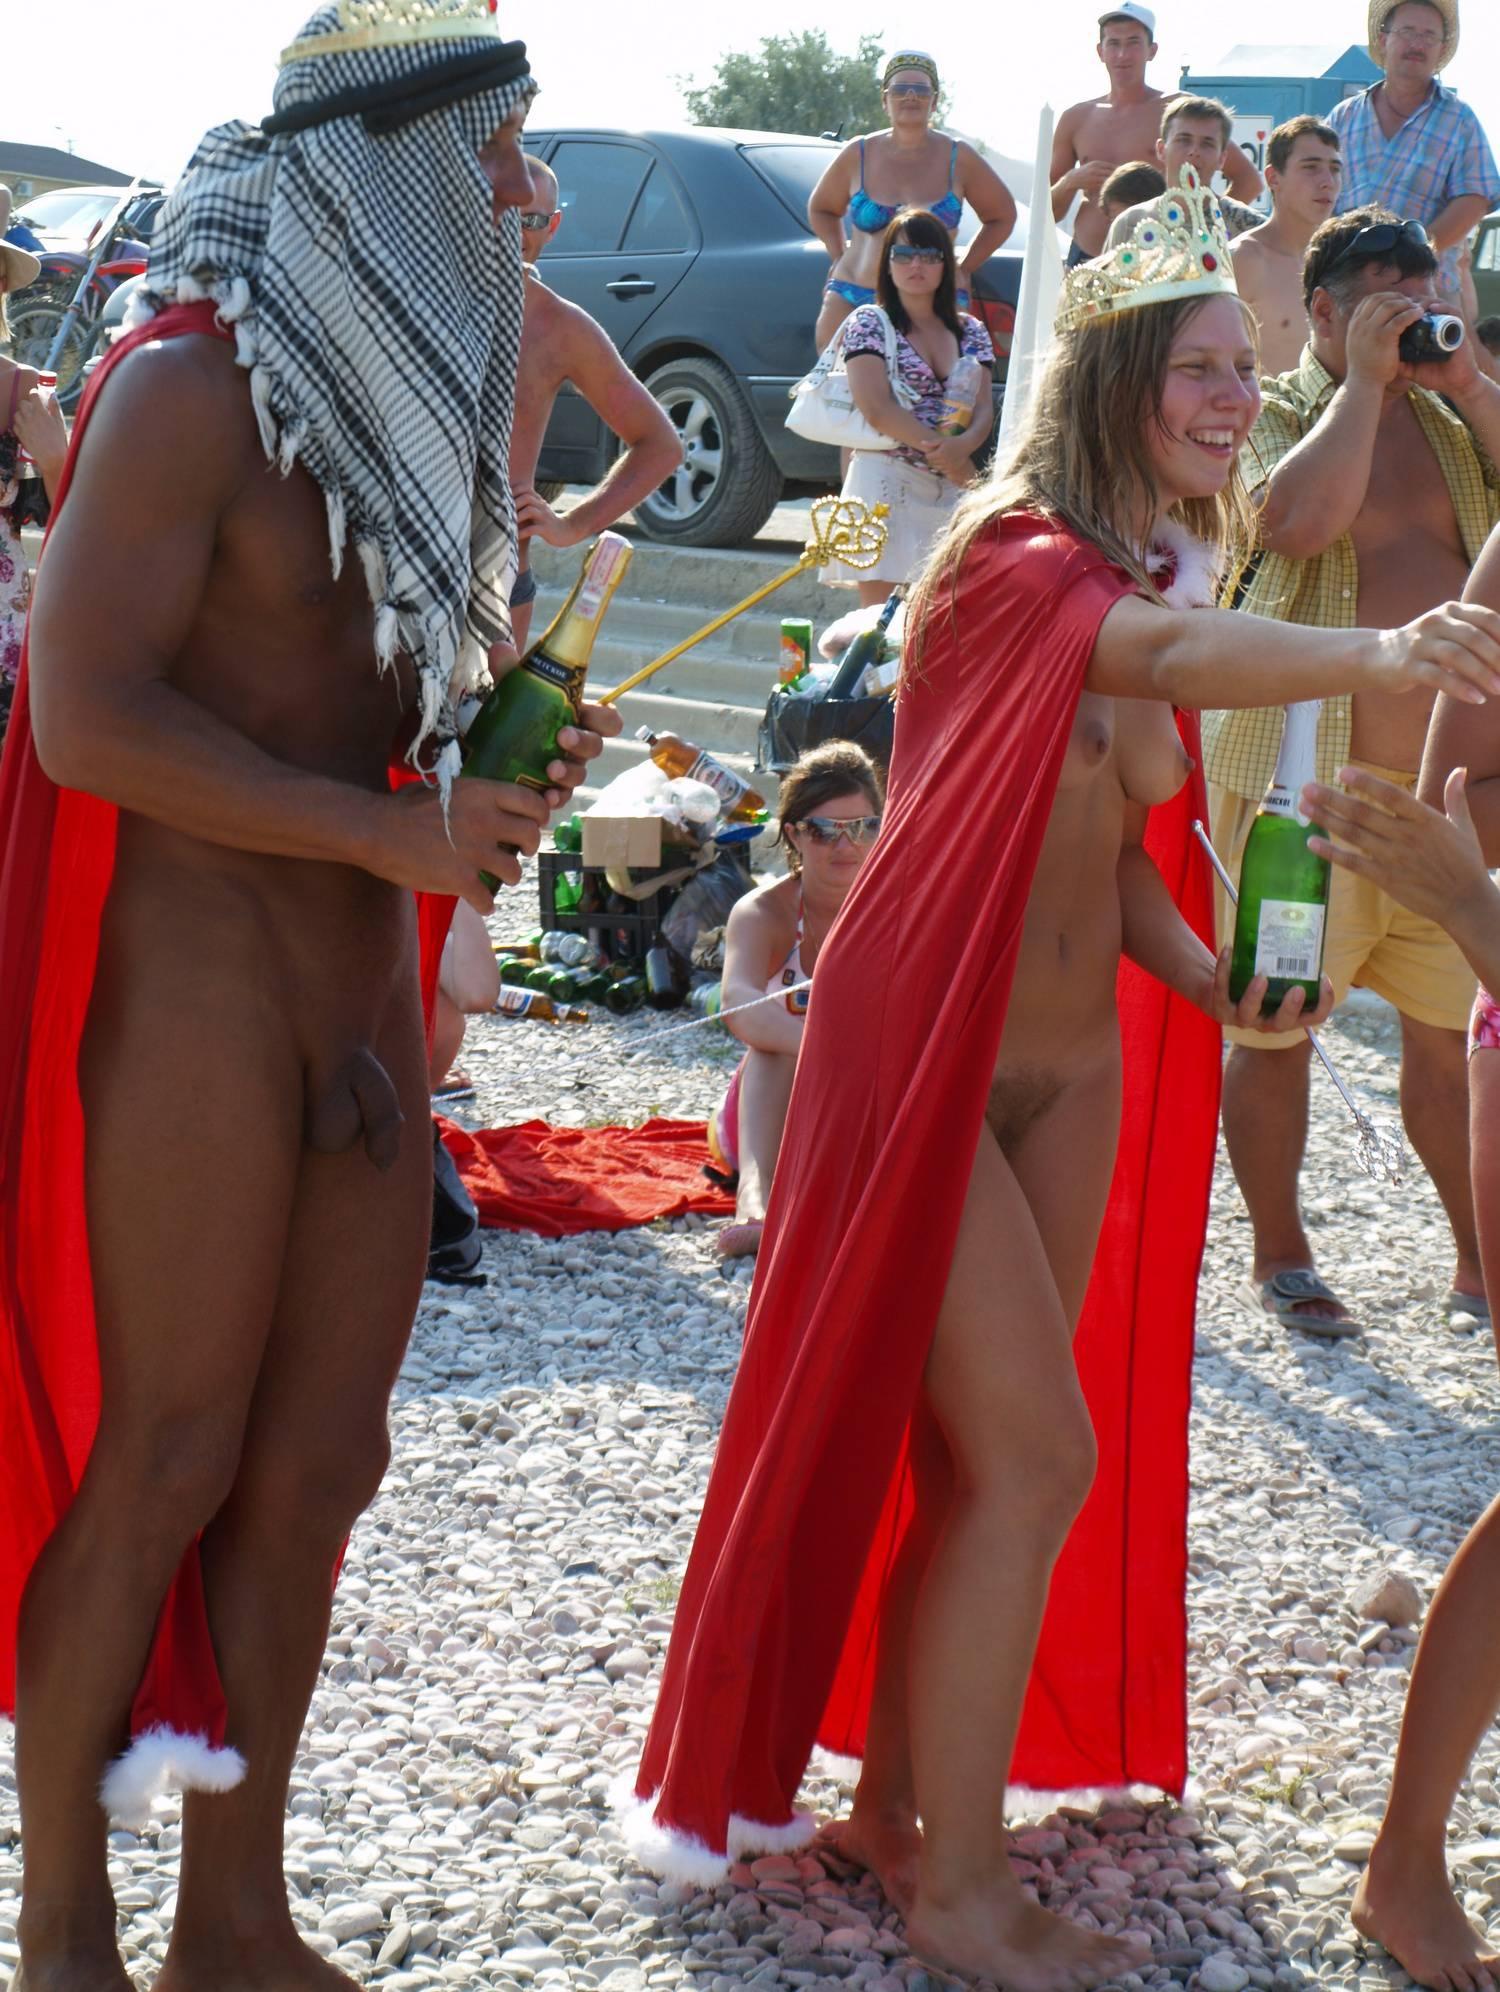 Nudist Photos Nudist Royal Family Show - 1